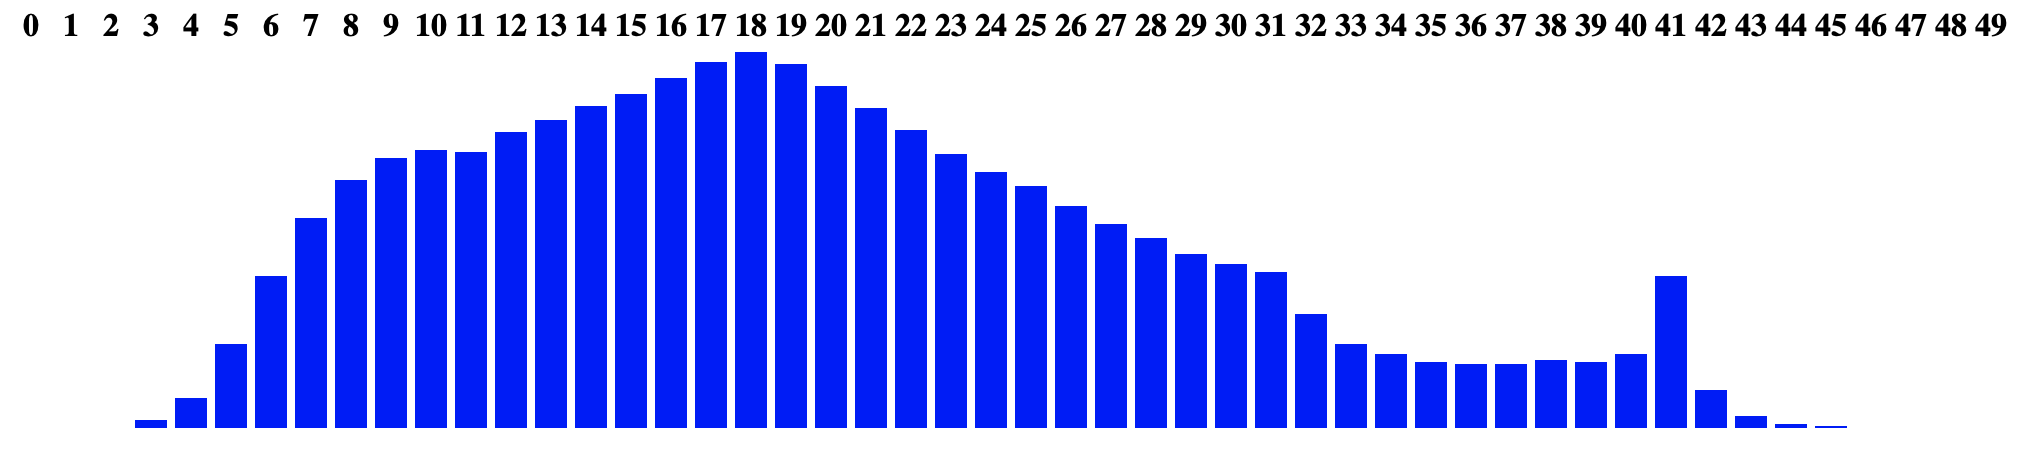 Distribution of 1,000,000 arbitrary integers